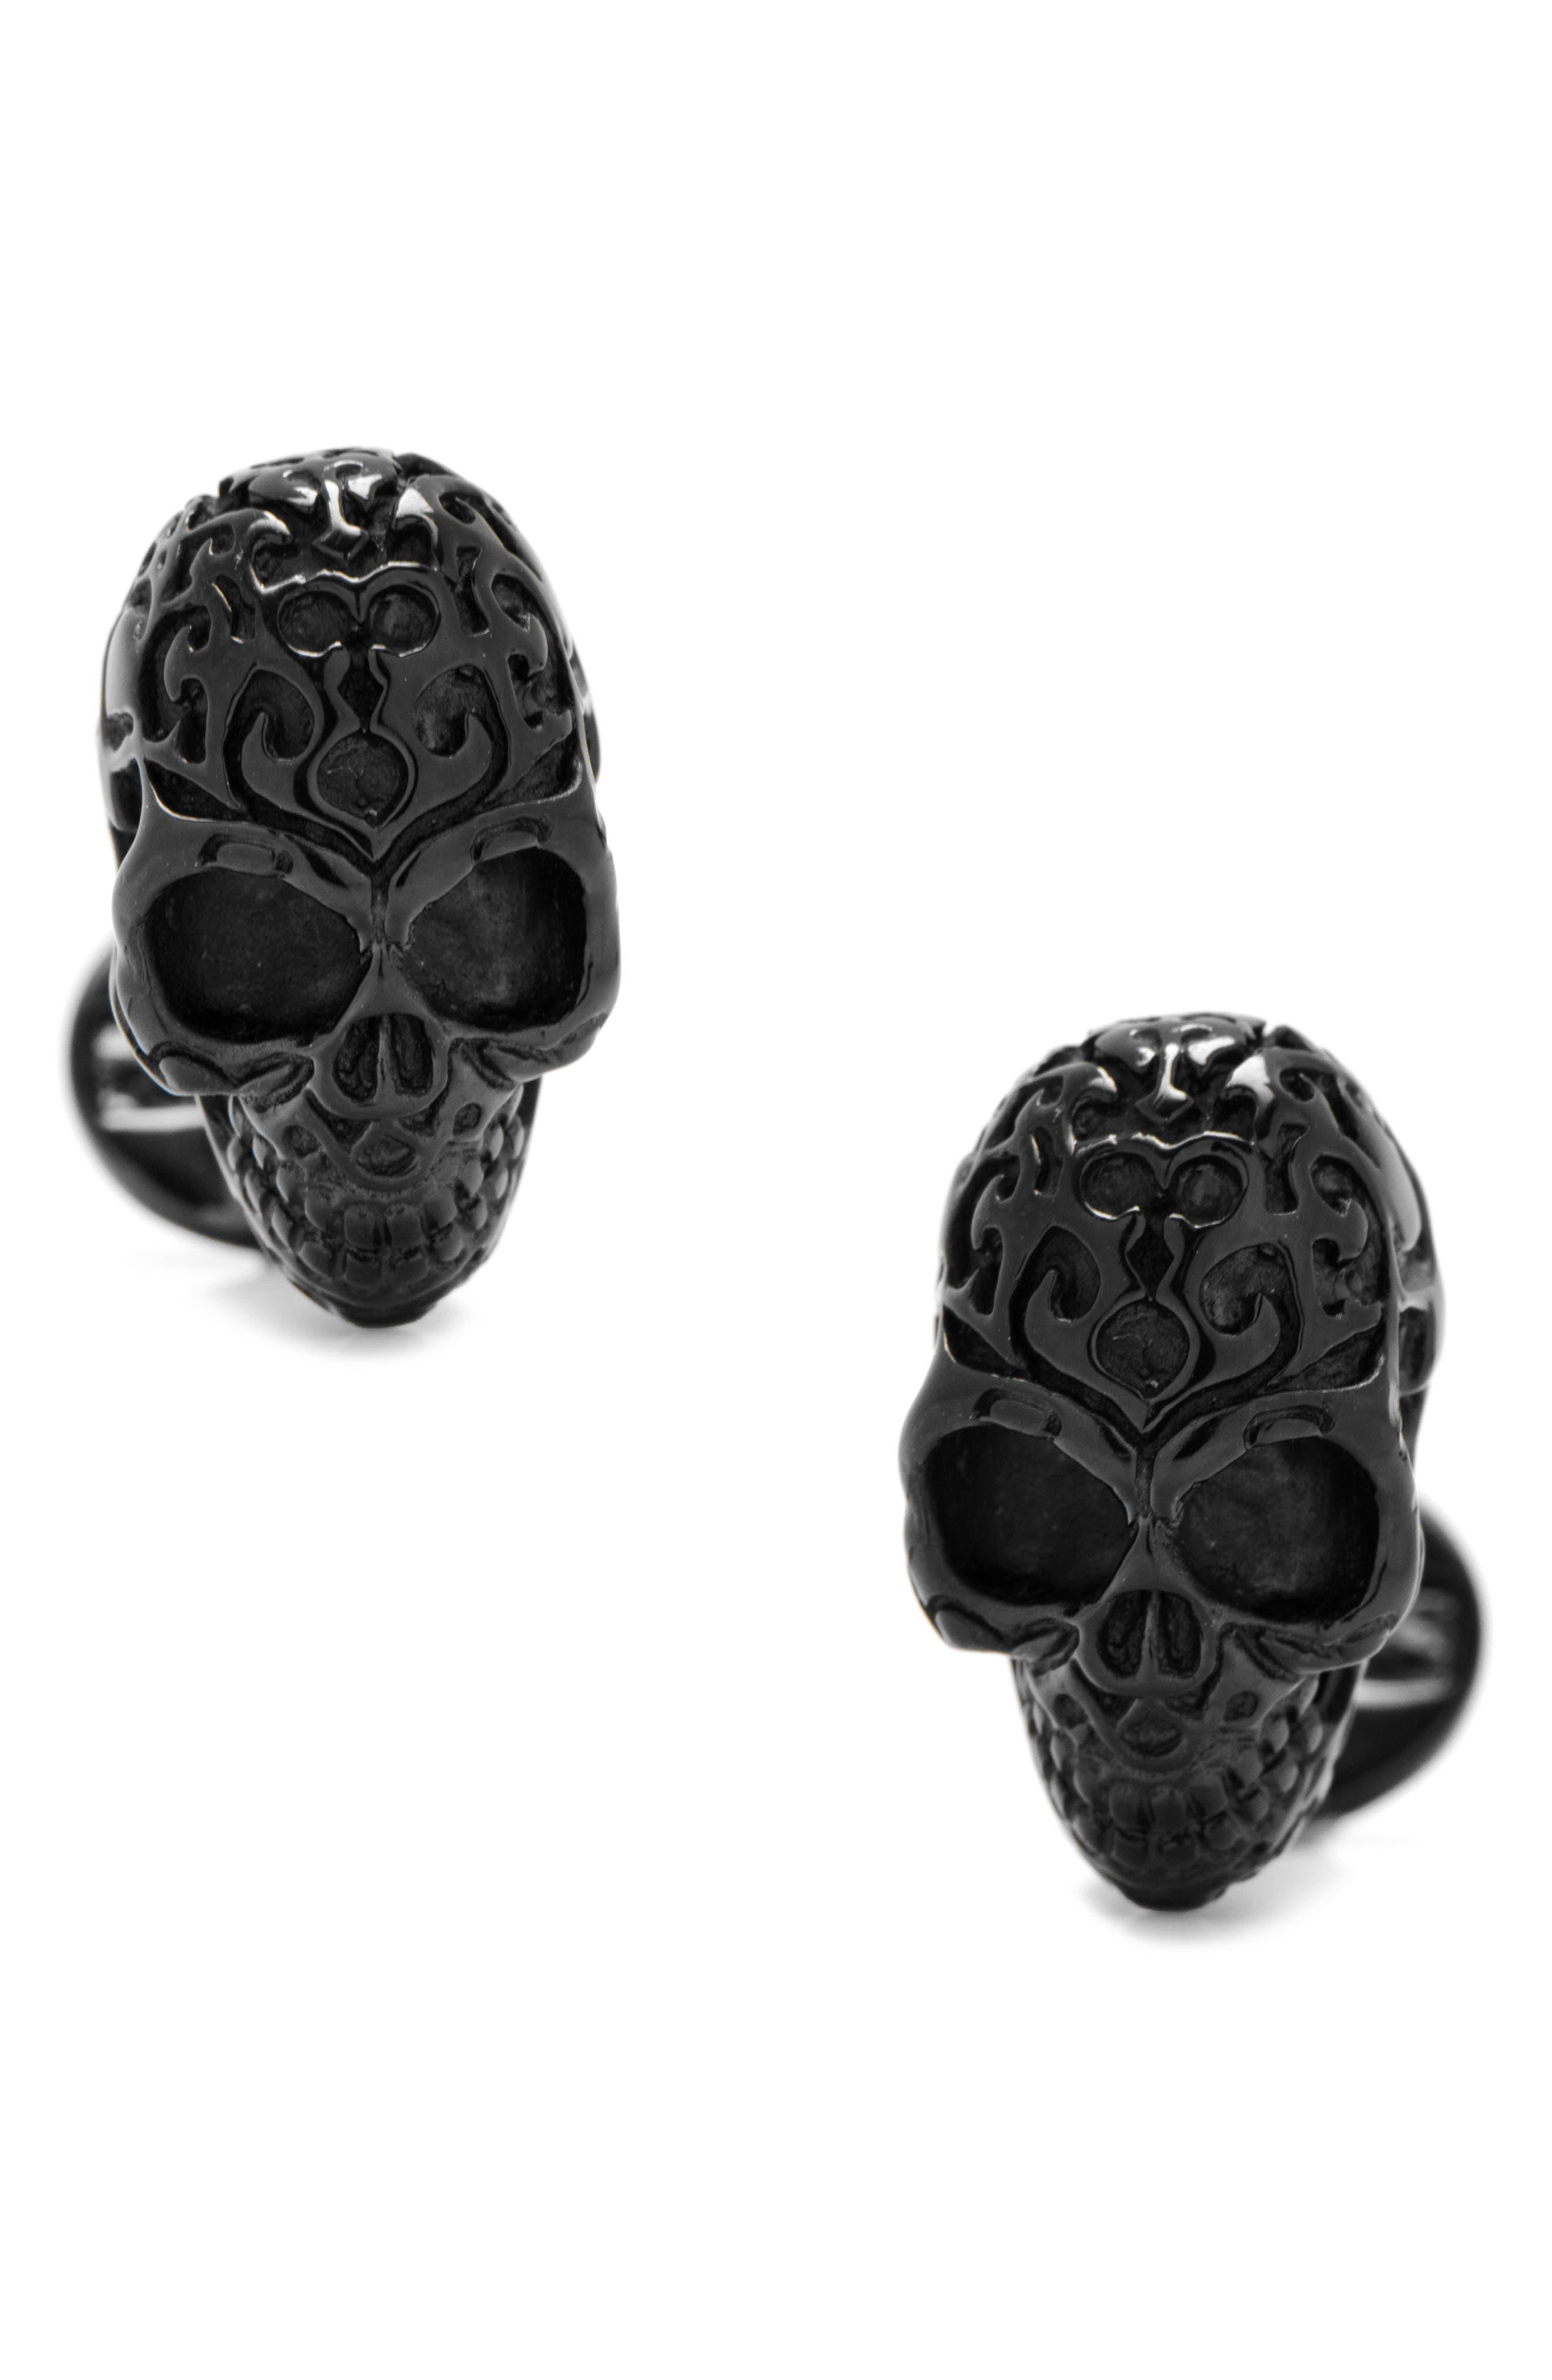 Black Fatale Skull Cuff Links,                         Main,                         color, BLACK